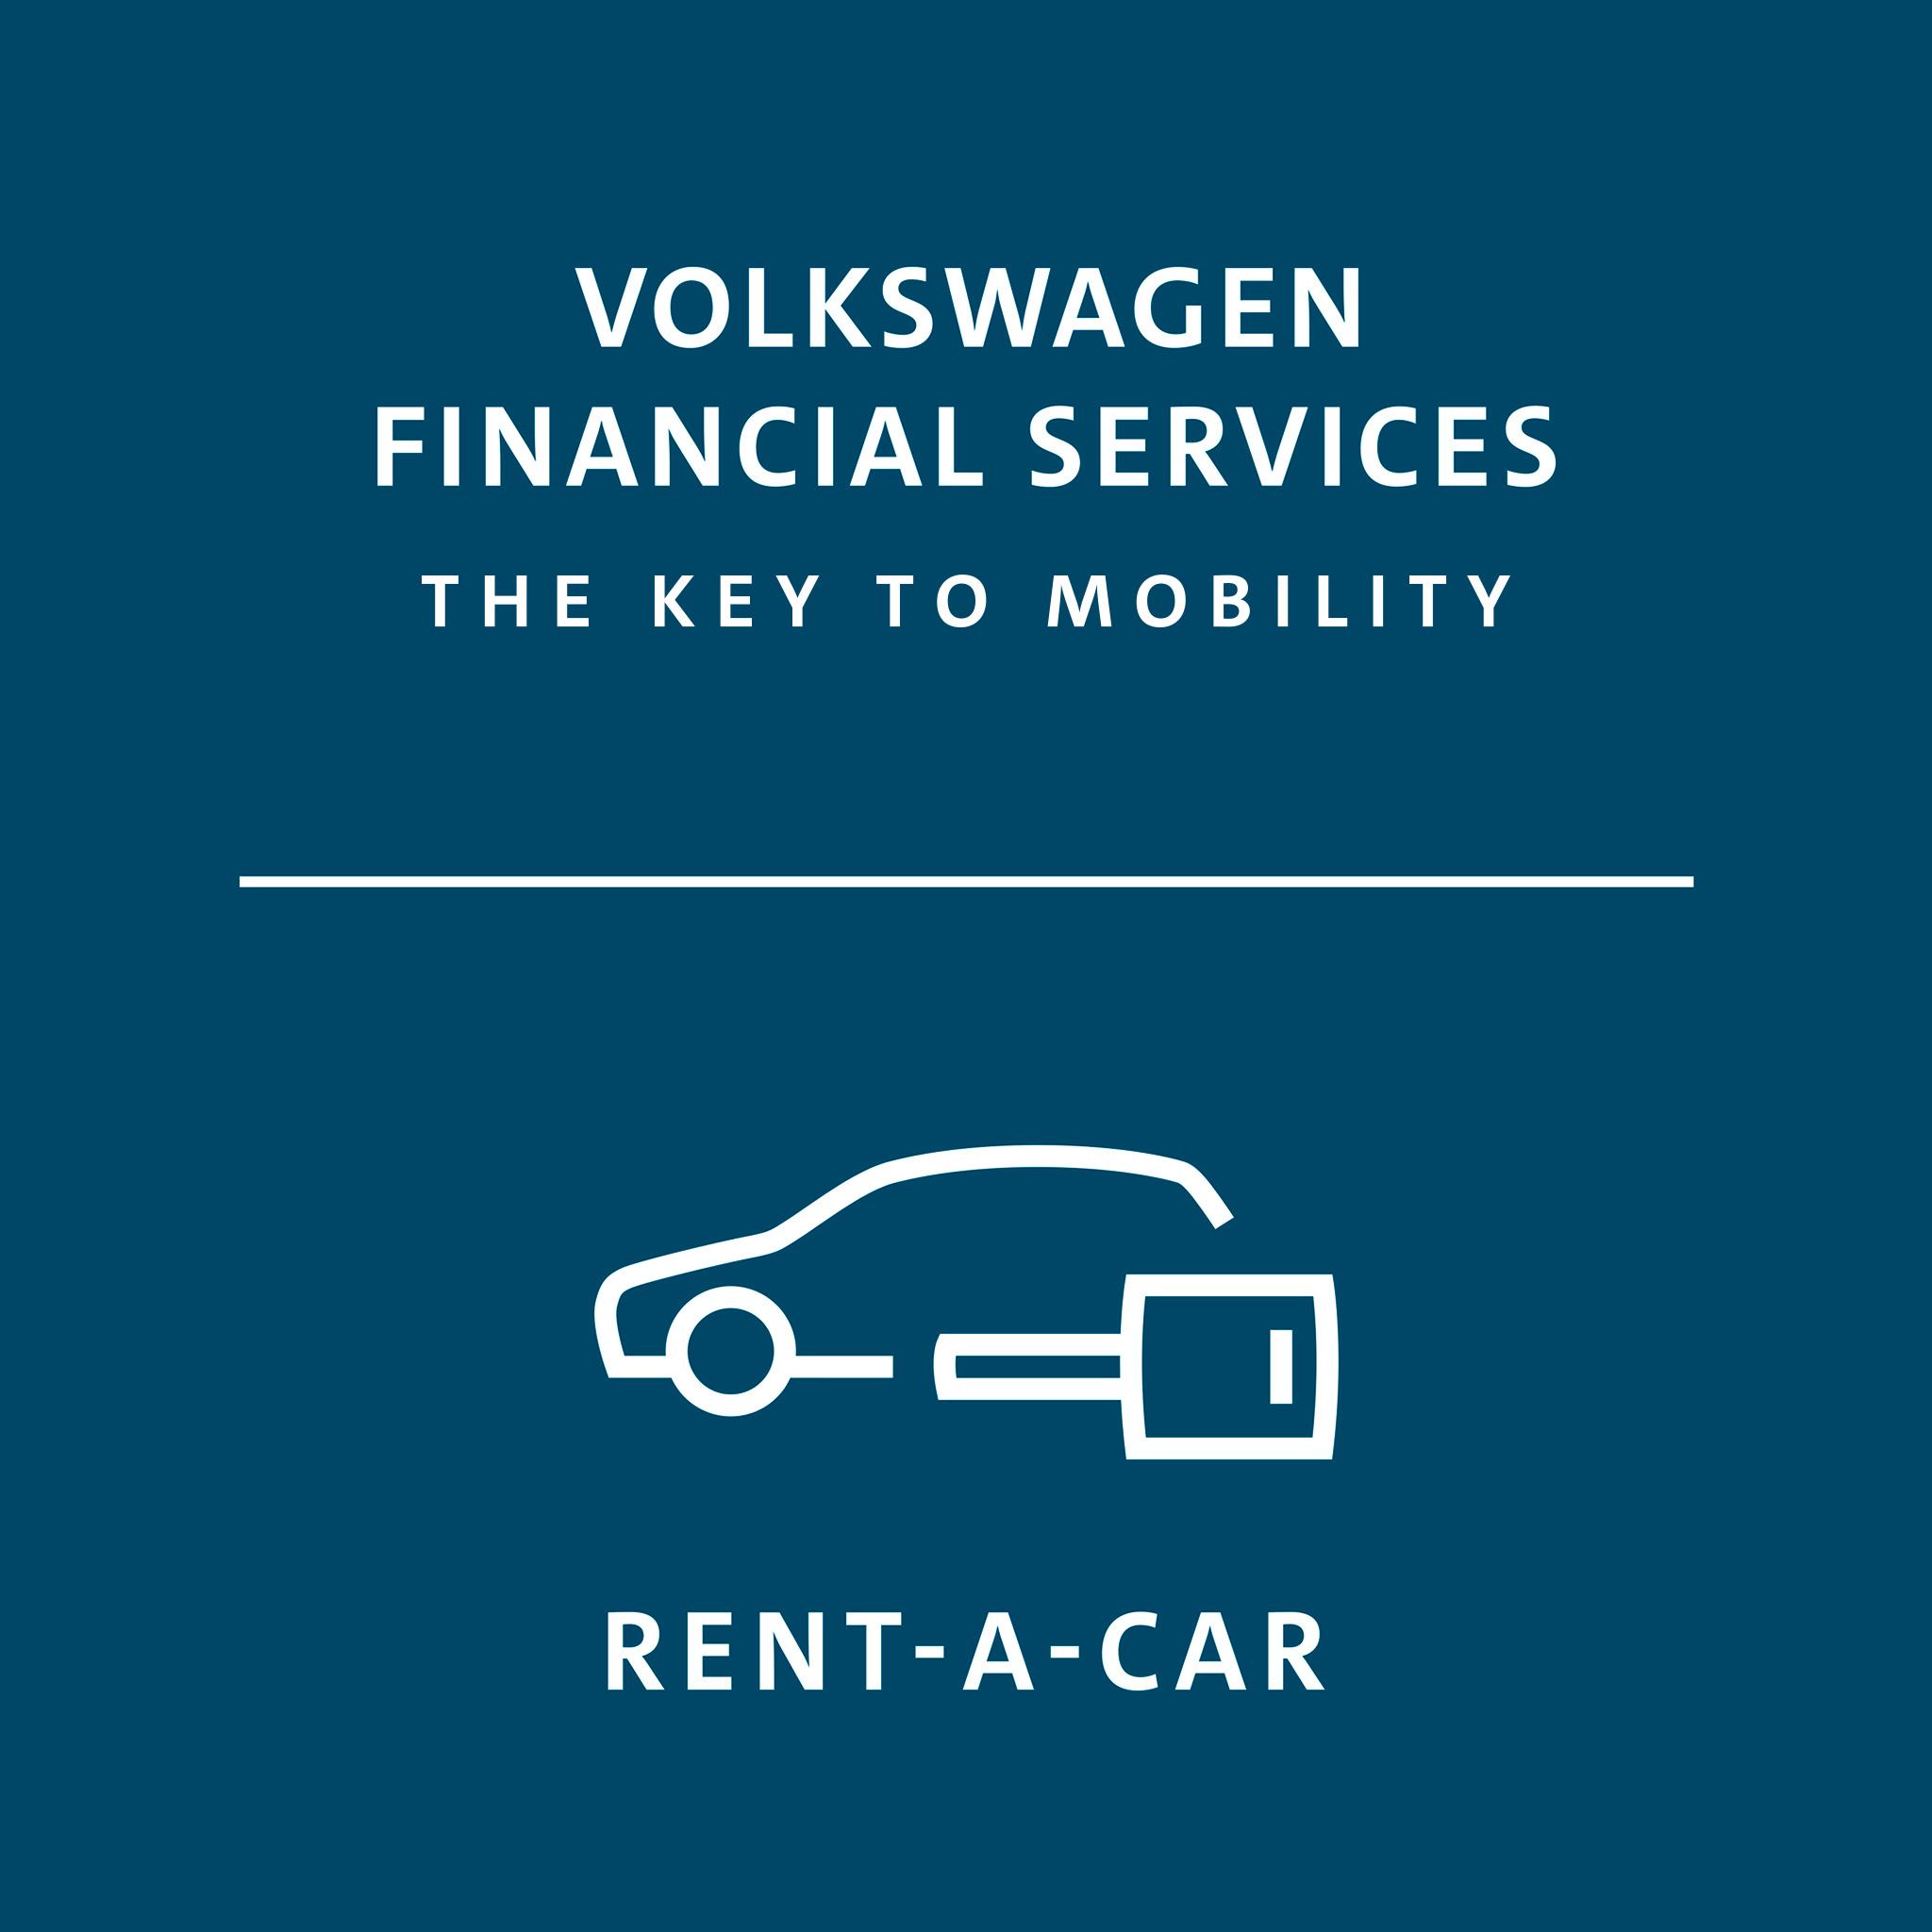 VW FS Rent-a-Car - Wolfsburg Ost Beesestraße